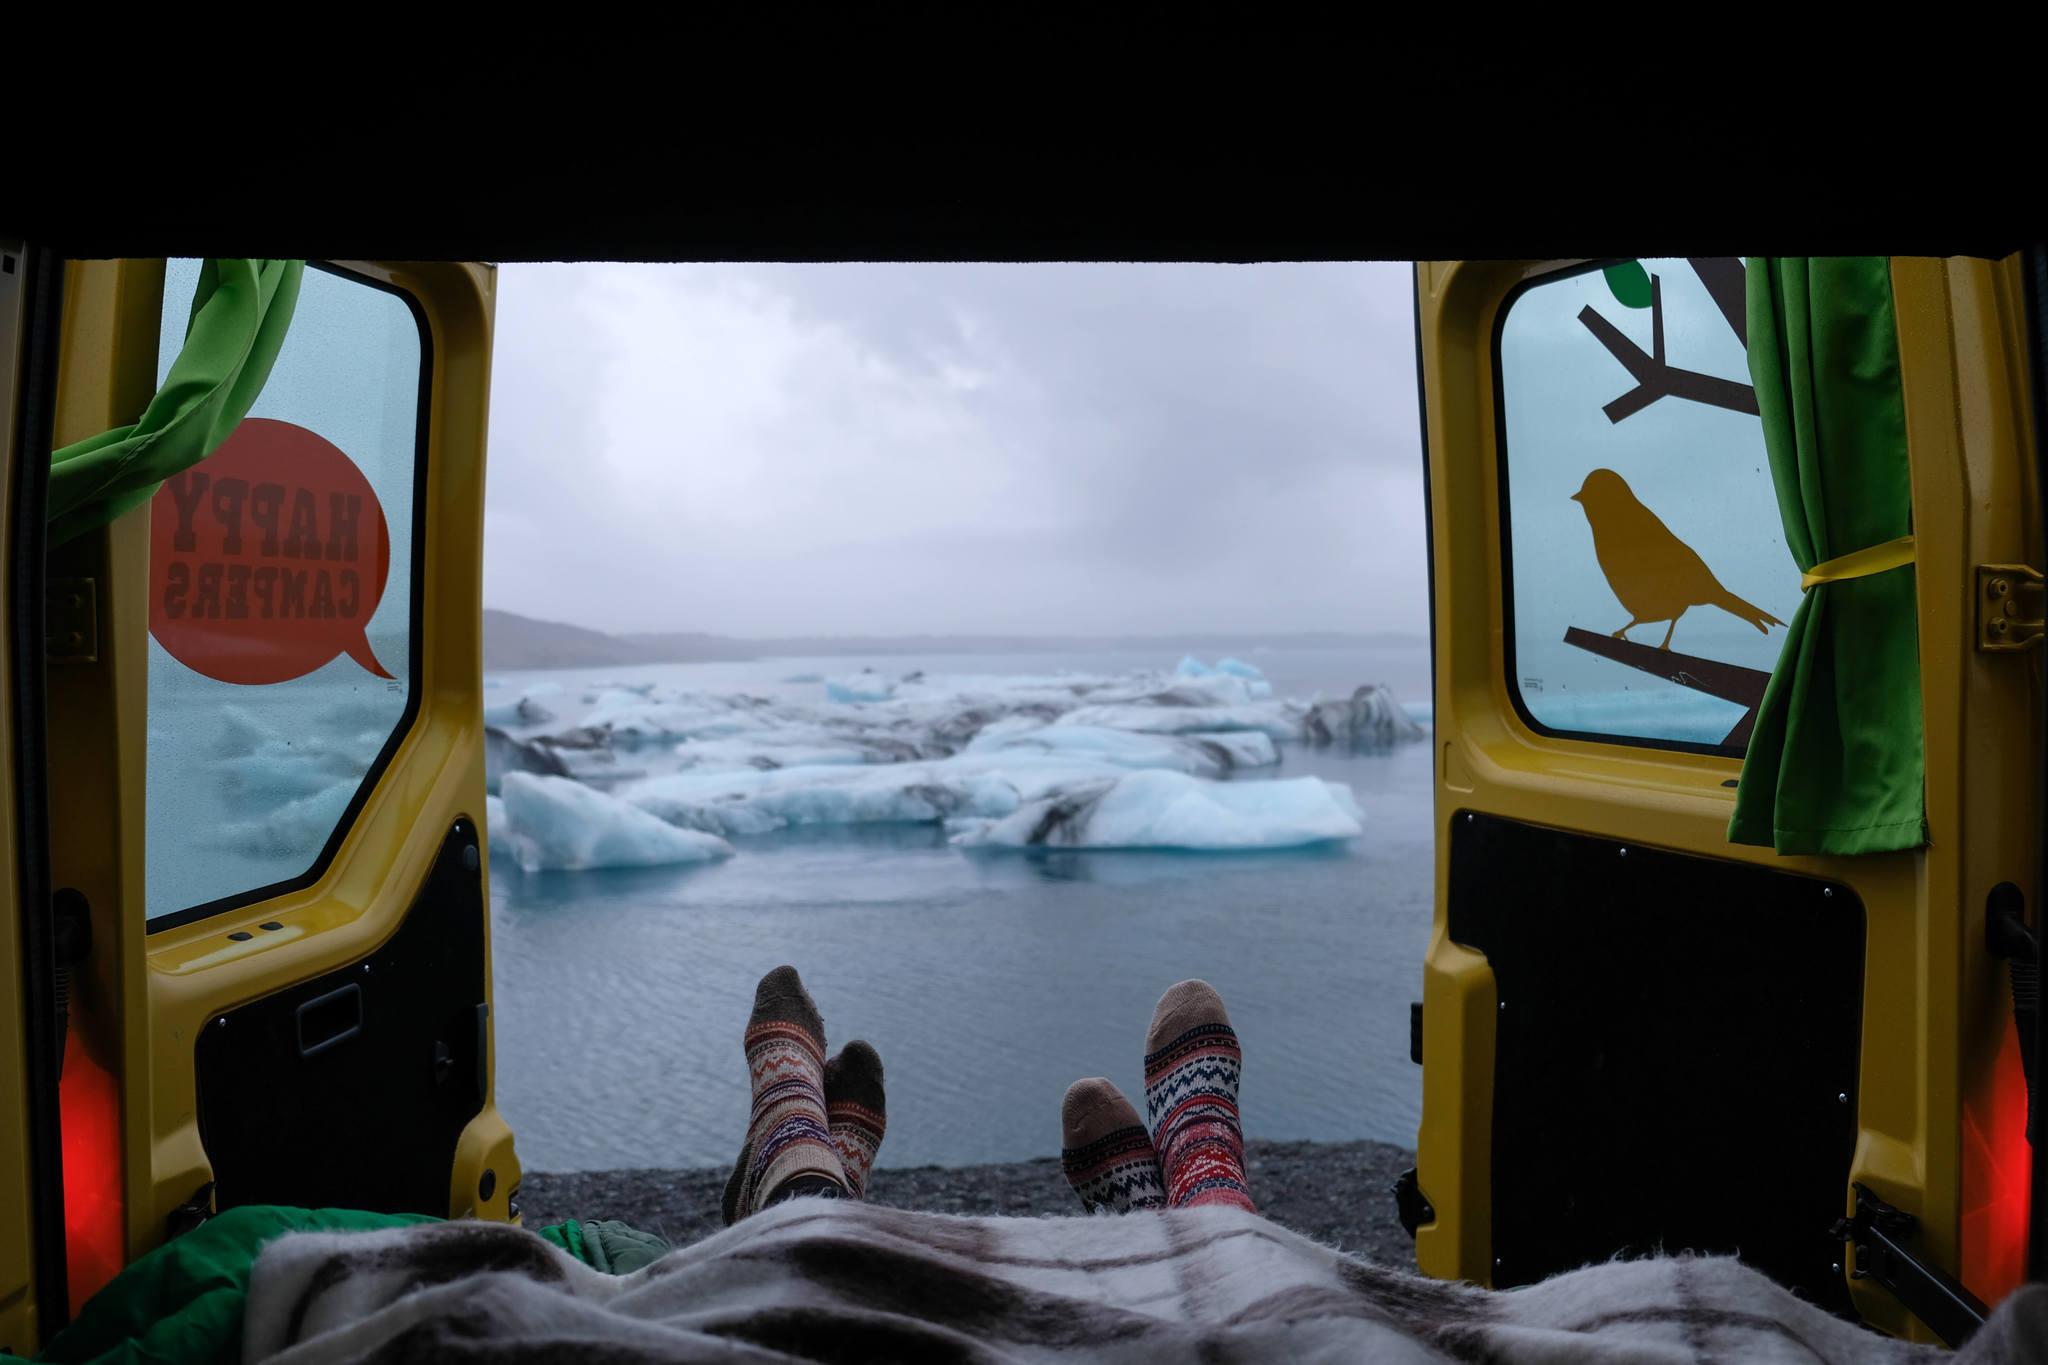 Camping at Jökulsárlón Glacier Lagoon